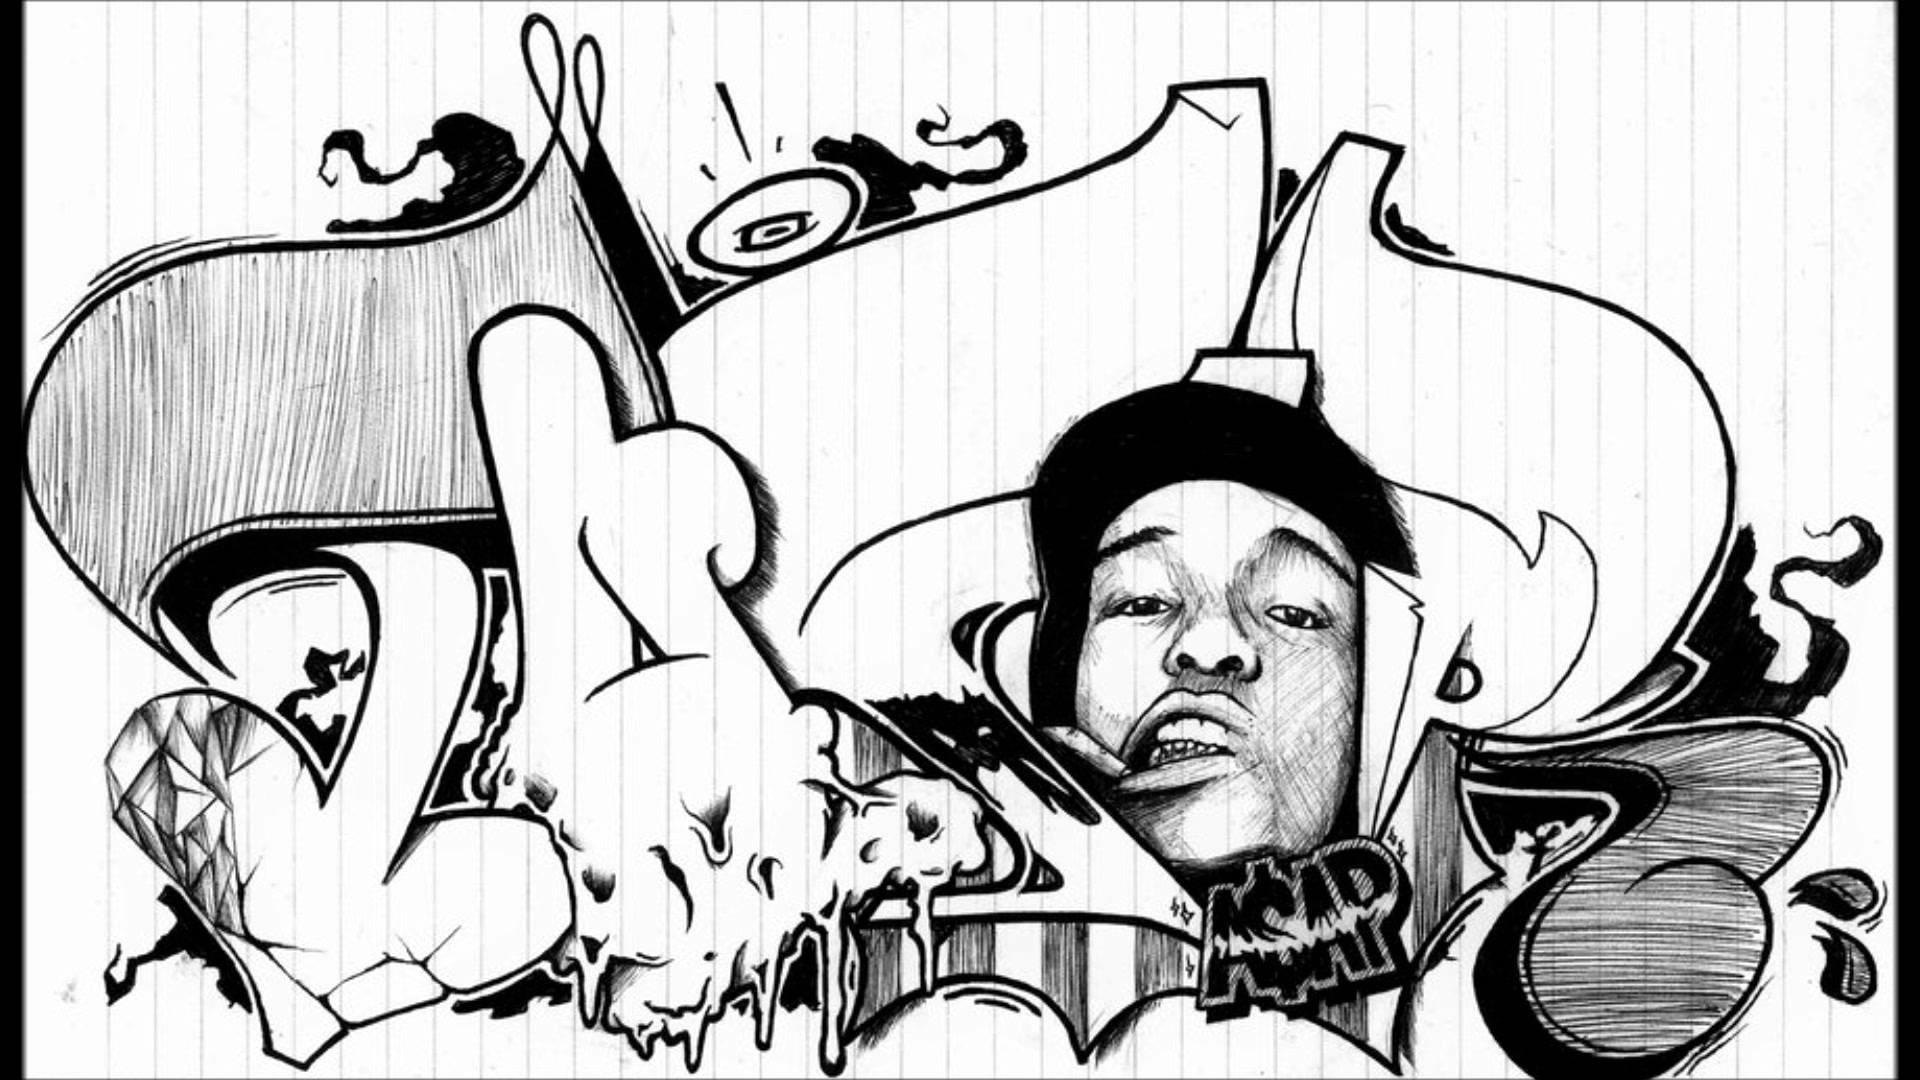 1920x1080 Asap Rocky Kid Cudi Type Beat